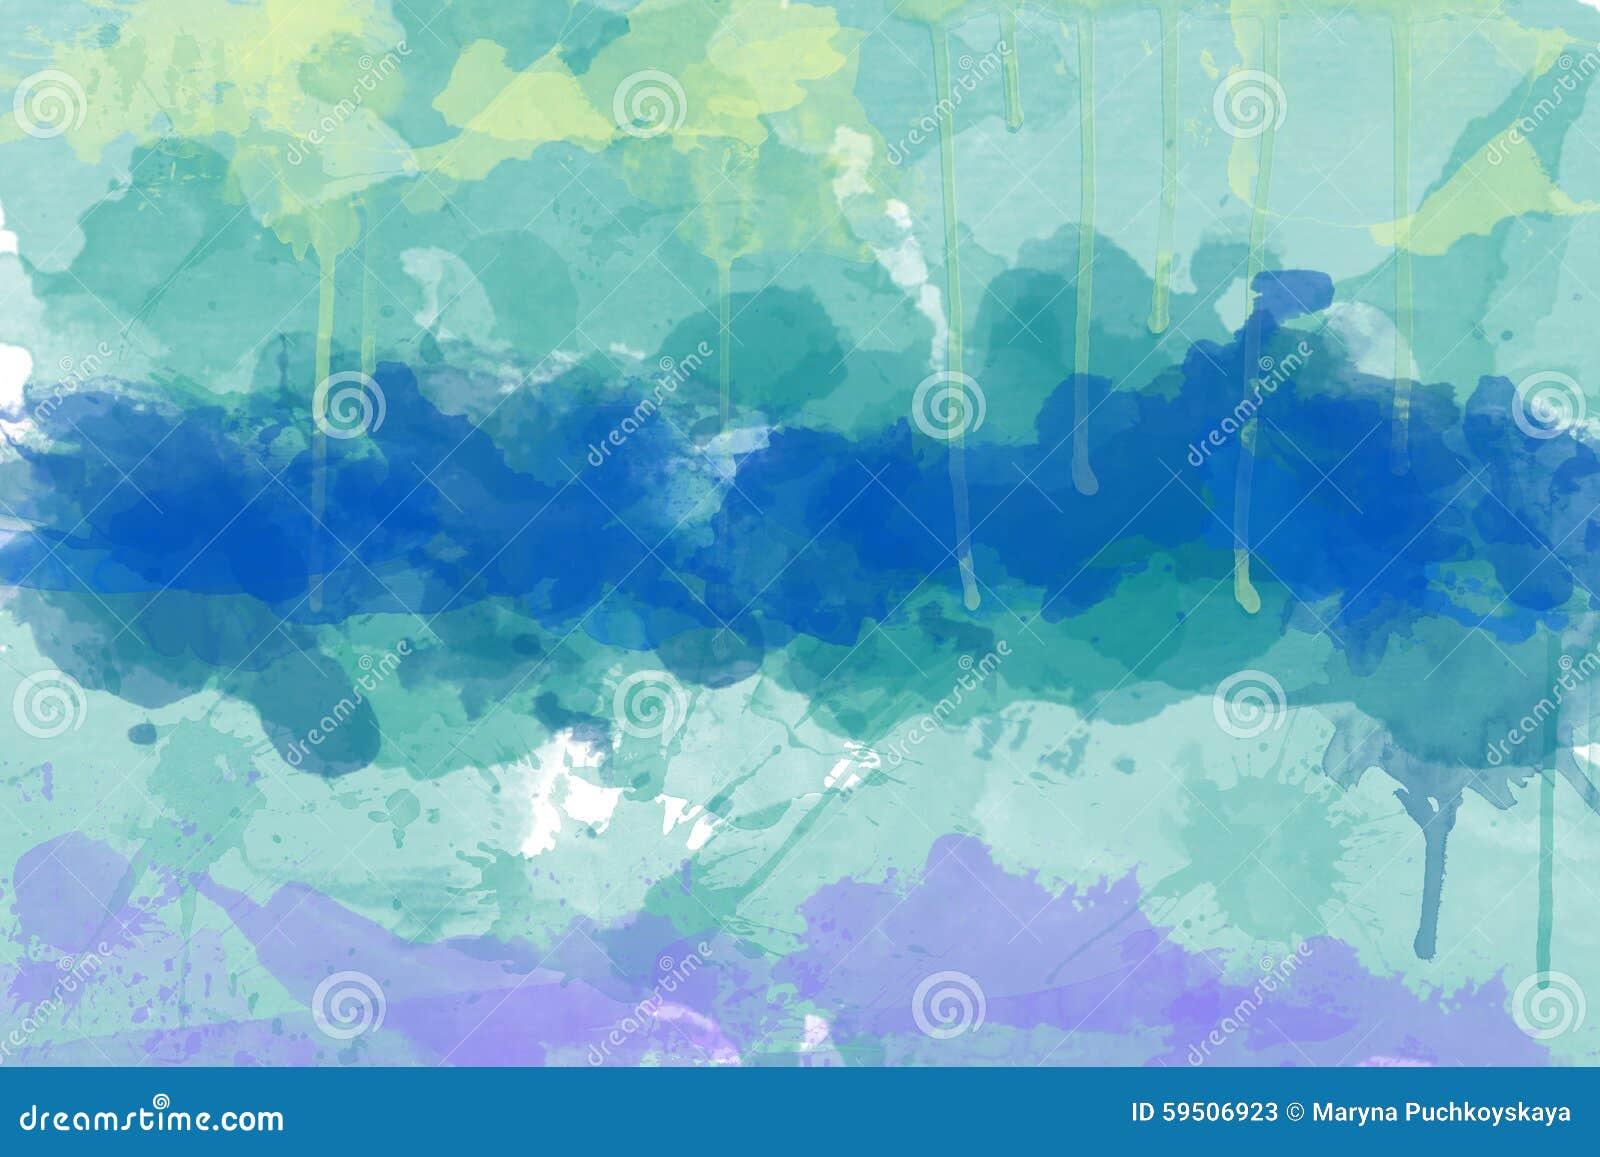 Multi-coloured spot, watercolour abstract